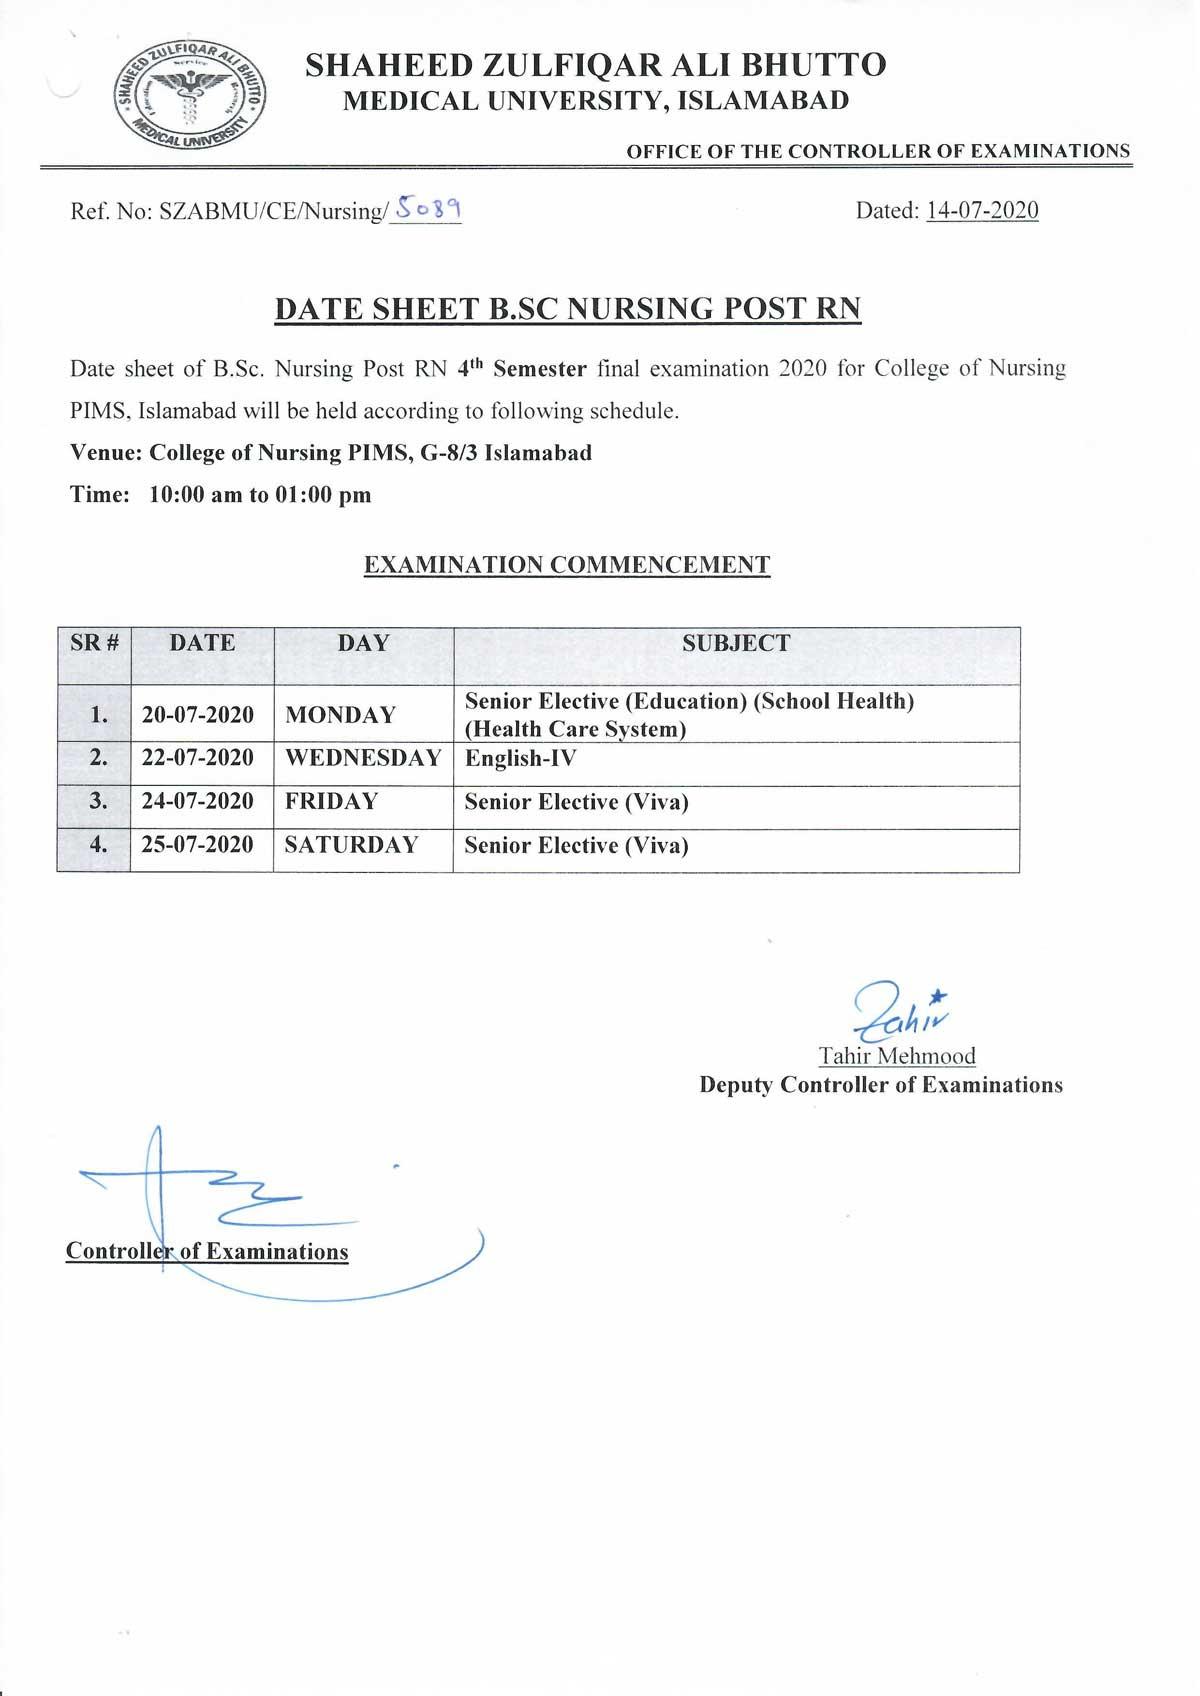 Date Sheet B.Sc Nursing Post RN 4th Semester College of Nursing, PIMS